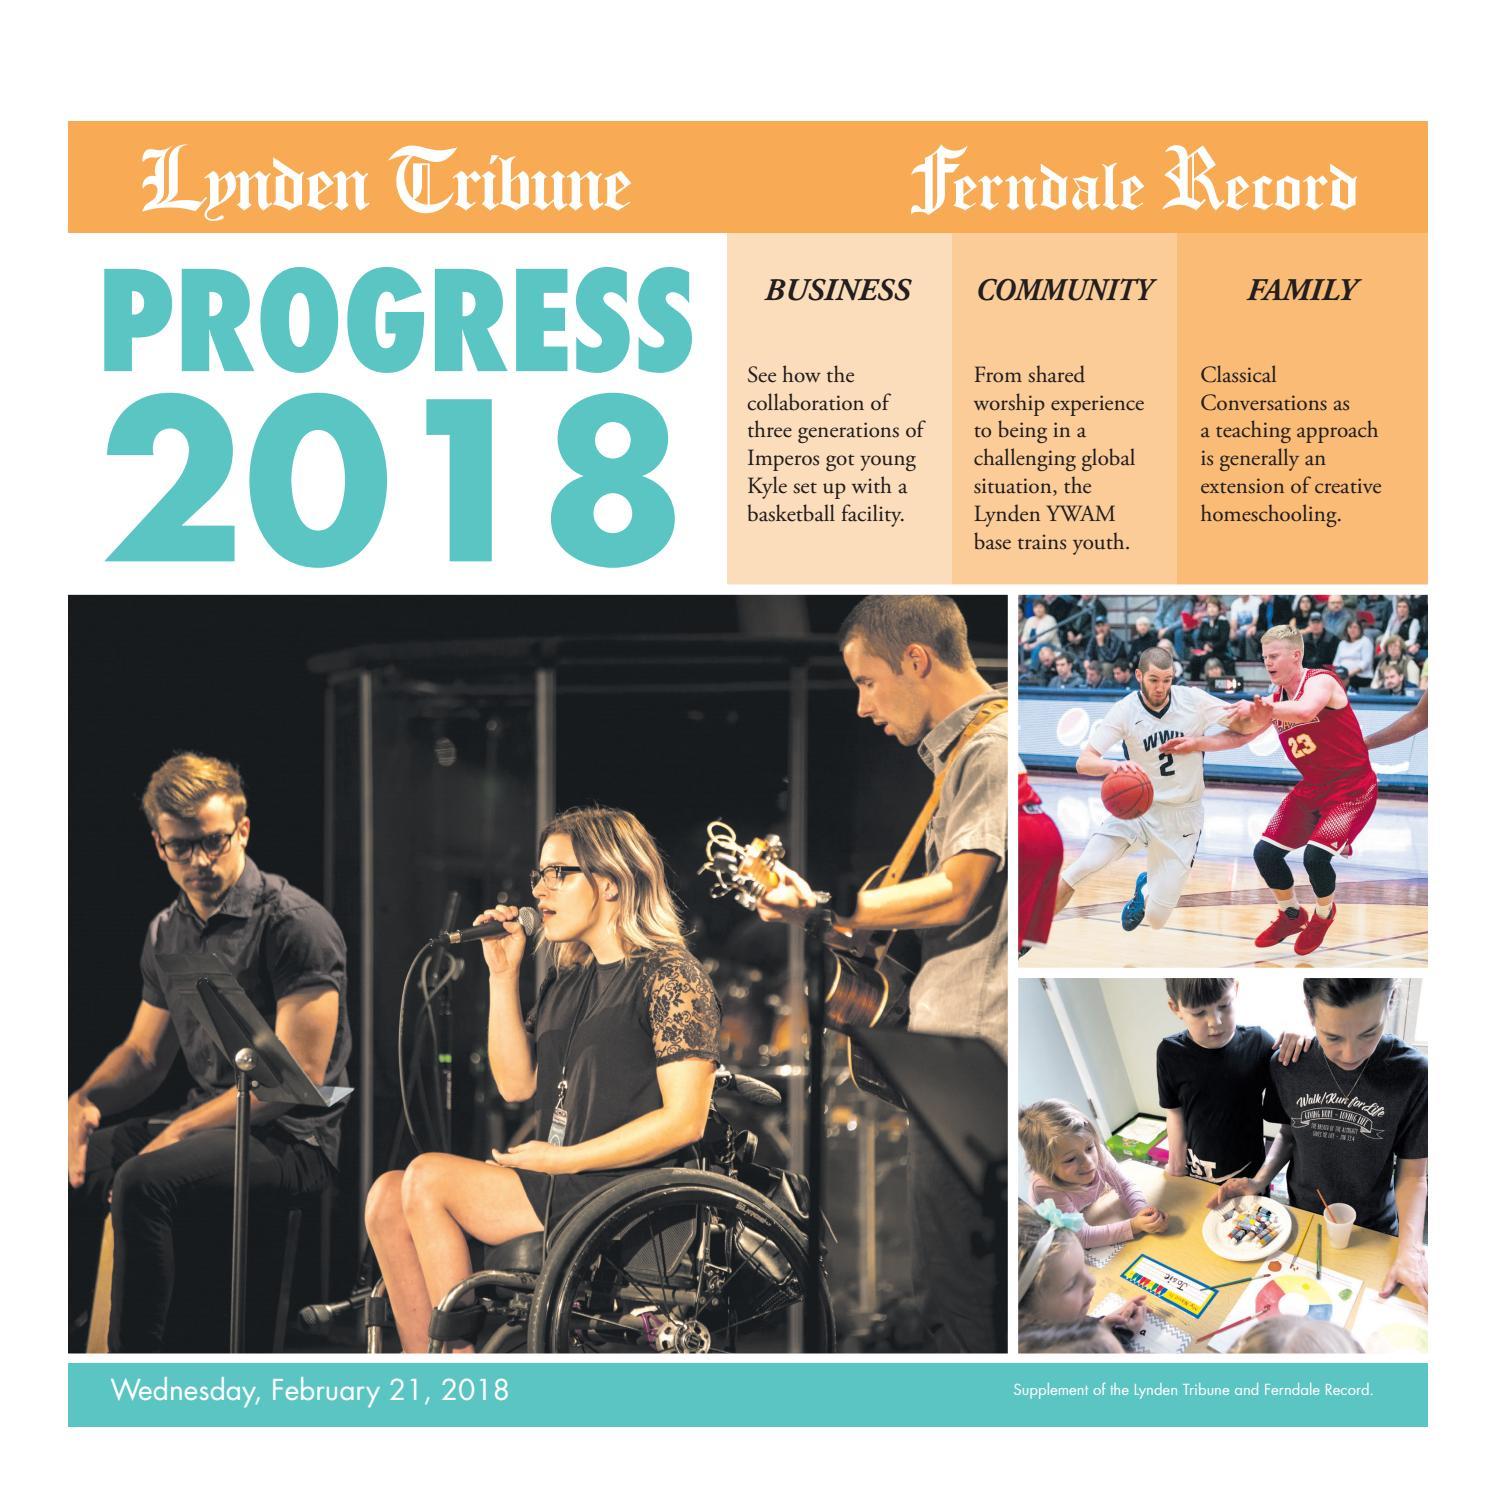 Progress 2018 by Lynden Tribune - issuu